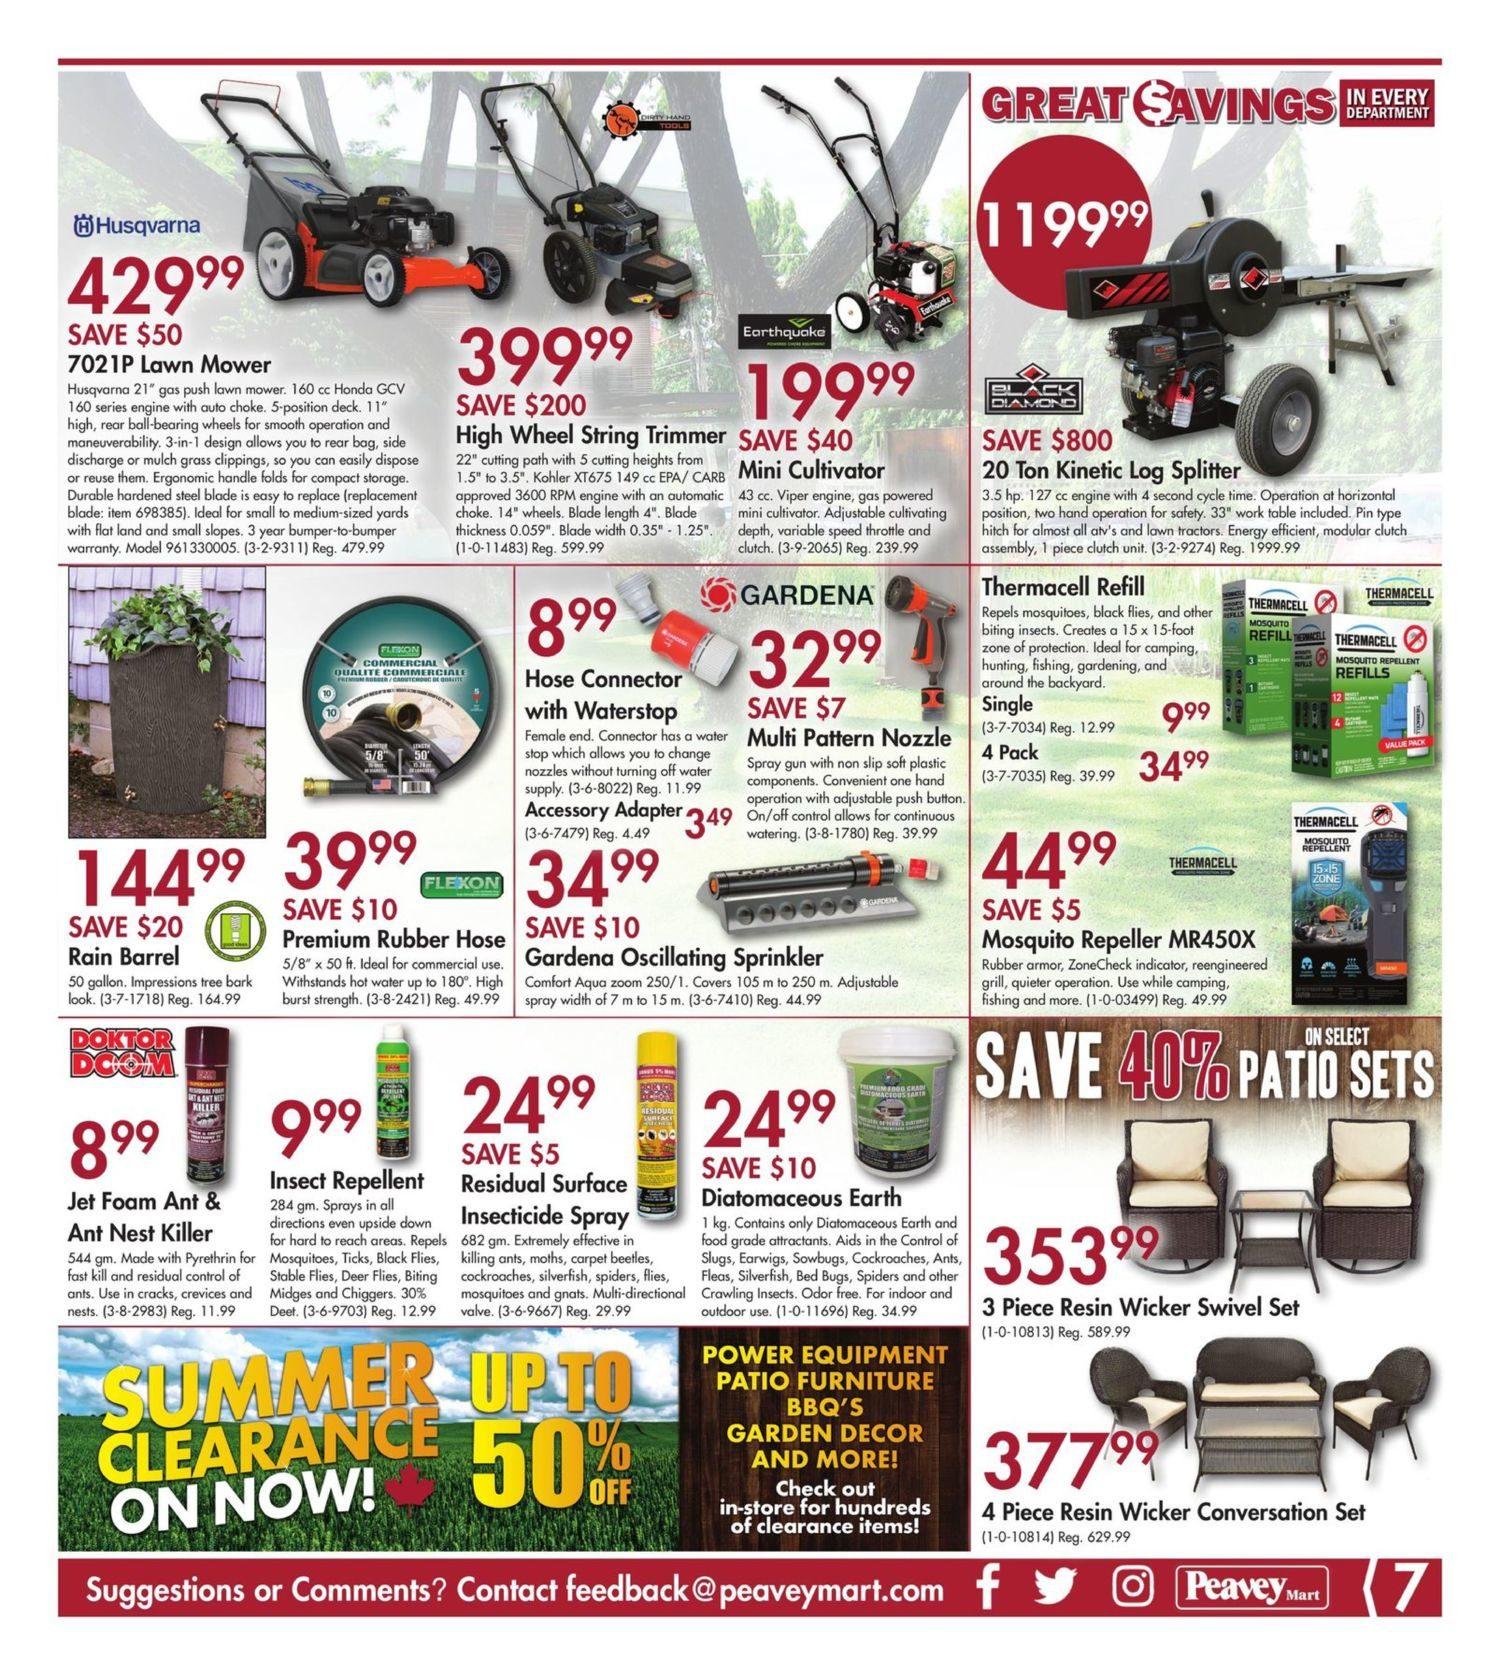 PeaveyMart Weekly Flyer - Hot Summer Savings - Jul 12 – 21